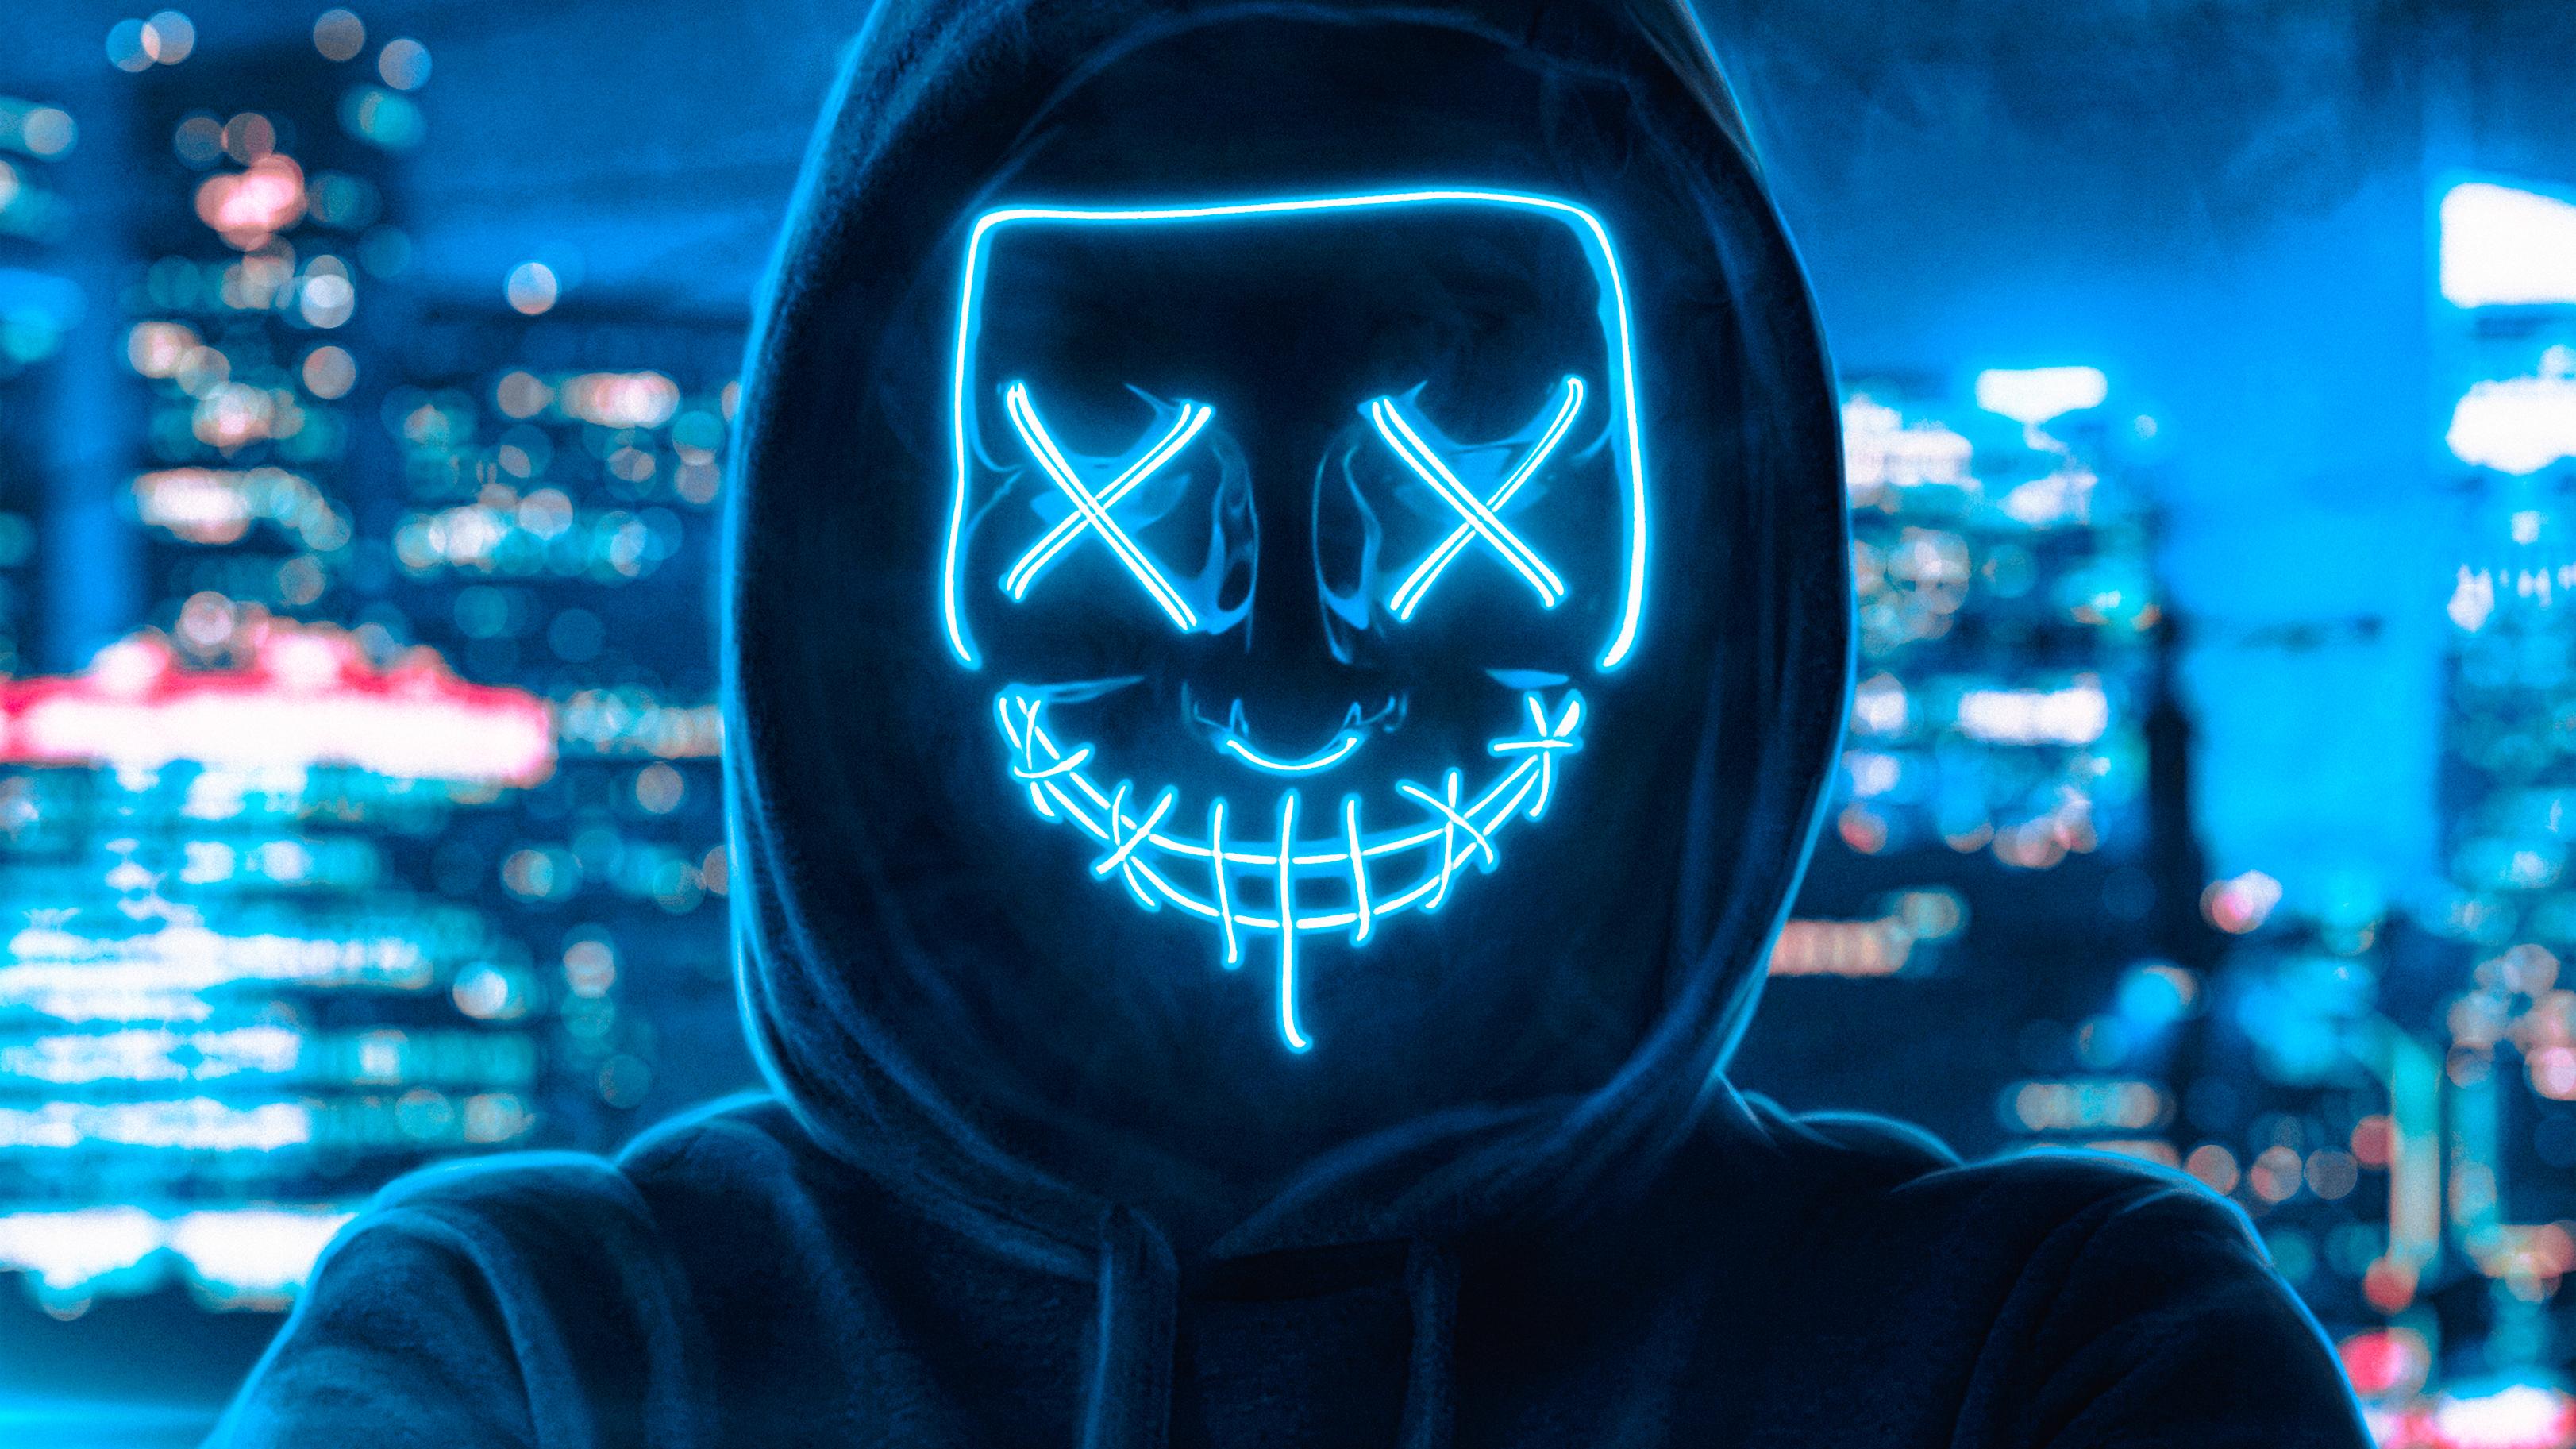 2560x1080 Hoodie Guy Mask Man 2560x1080 Resolution HD 4k ...